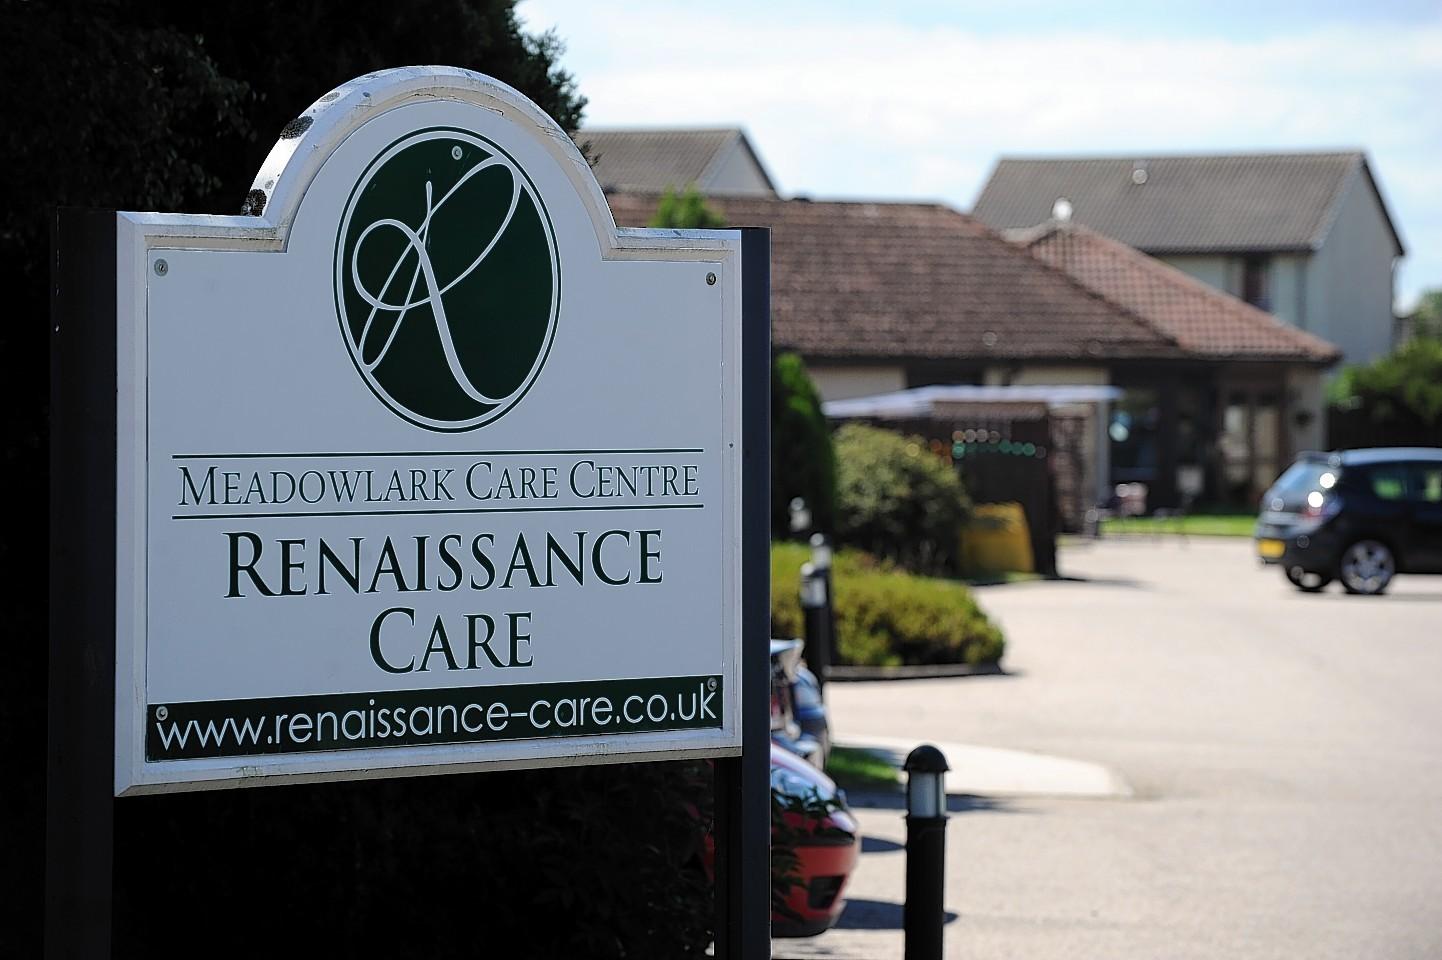 Meadowbank Care Centre